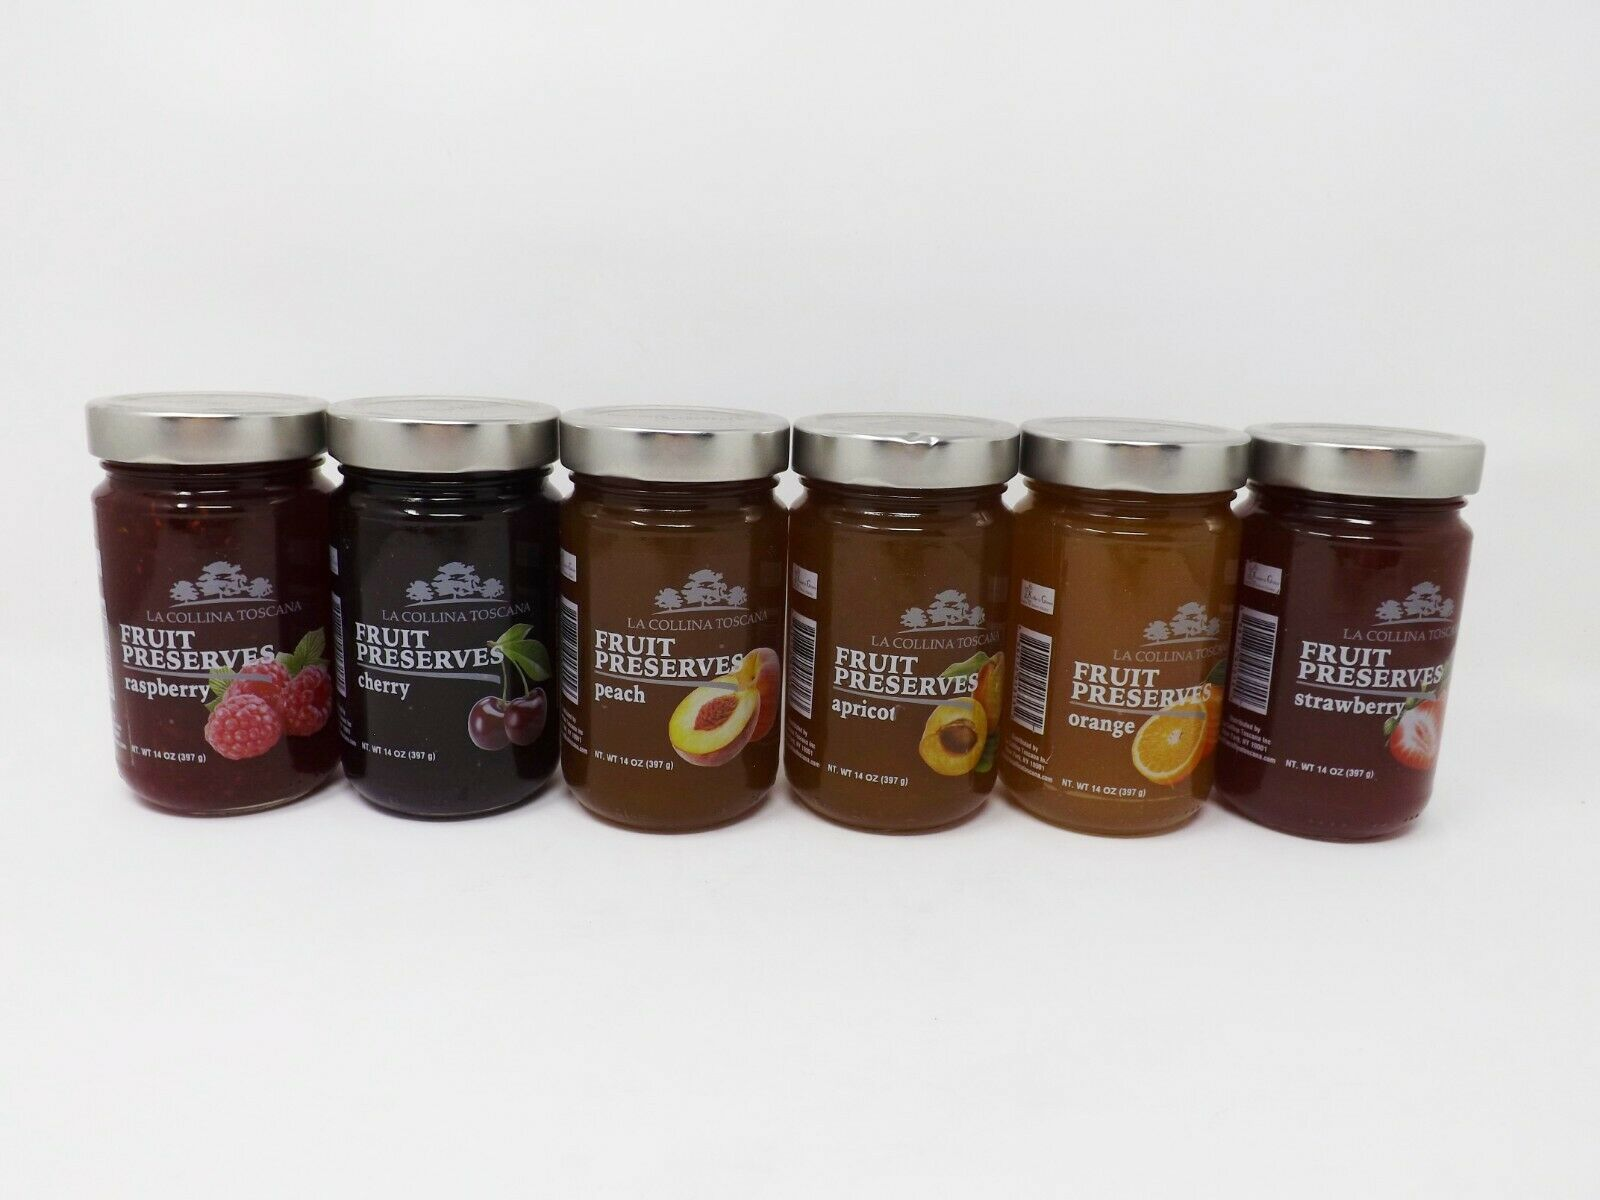 La Collina Toscana Fruit Preserves - 14 oz.